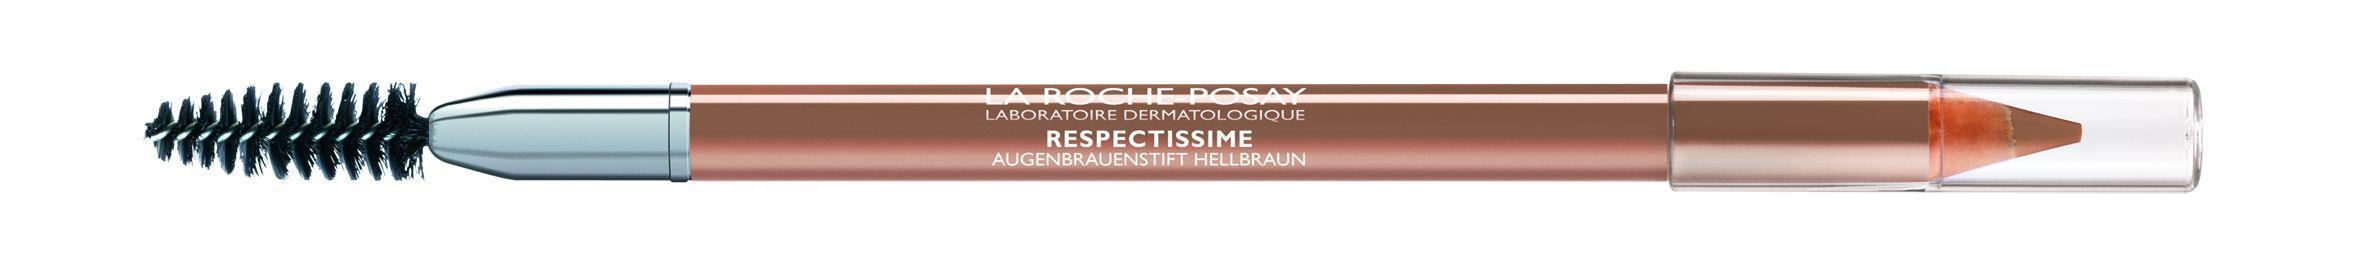 La Roche-Posay Respectissime Augenbrauenstift